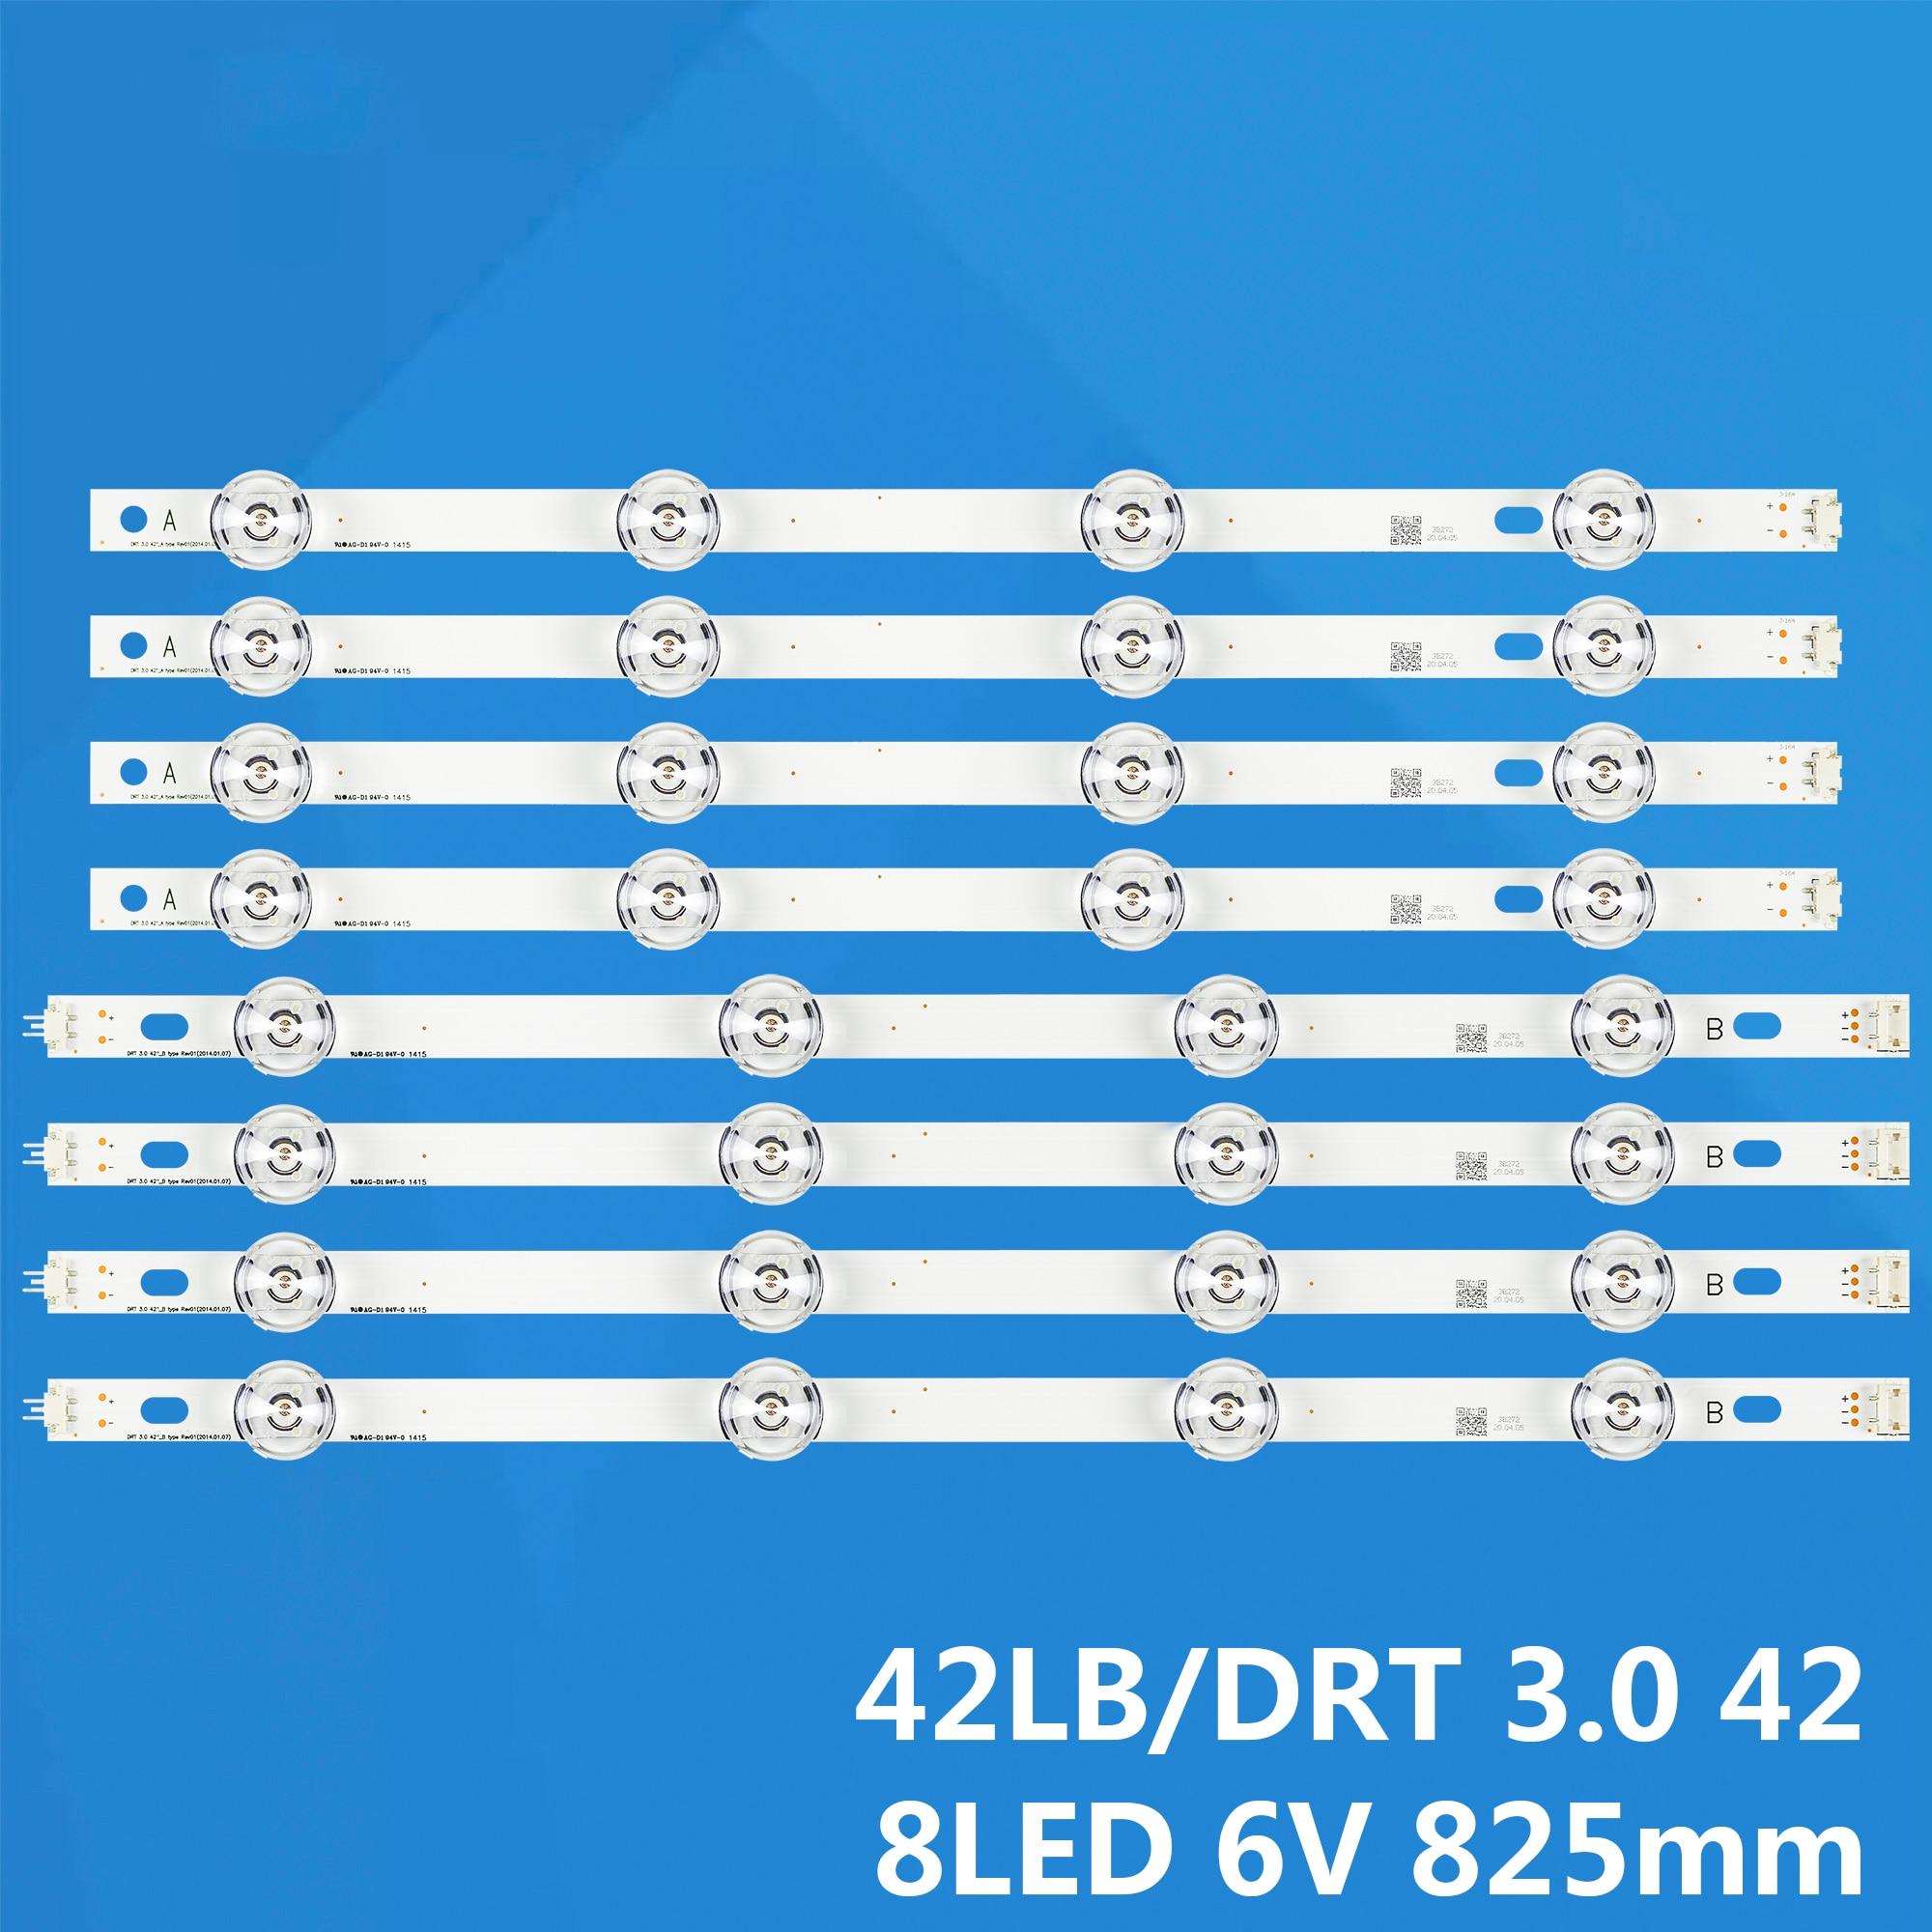 Nueva tira de 8 unids/set LED para LG LC420DUE 42LF5500 42LB6200 INNOTEK DRT 3,0 42 pulgadas A B 6916L-1957E 6916L-1956E